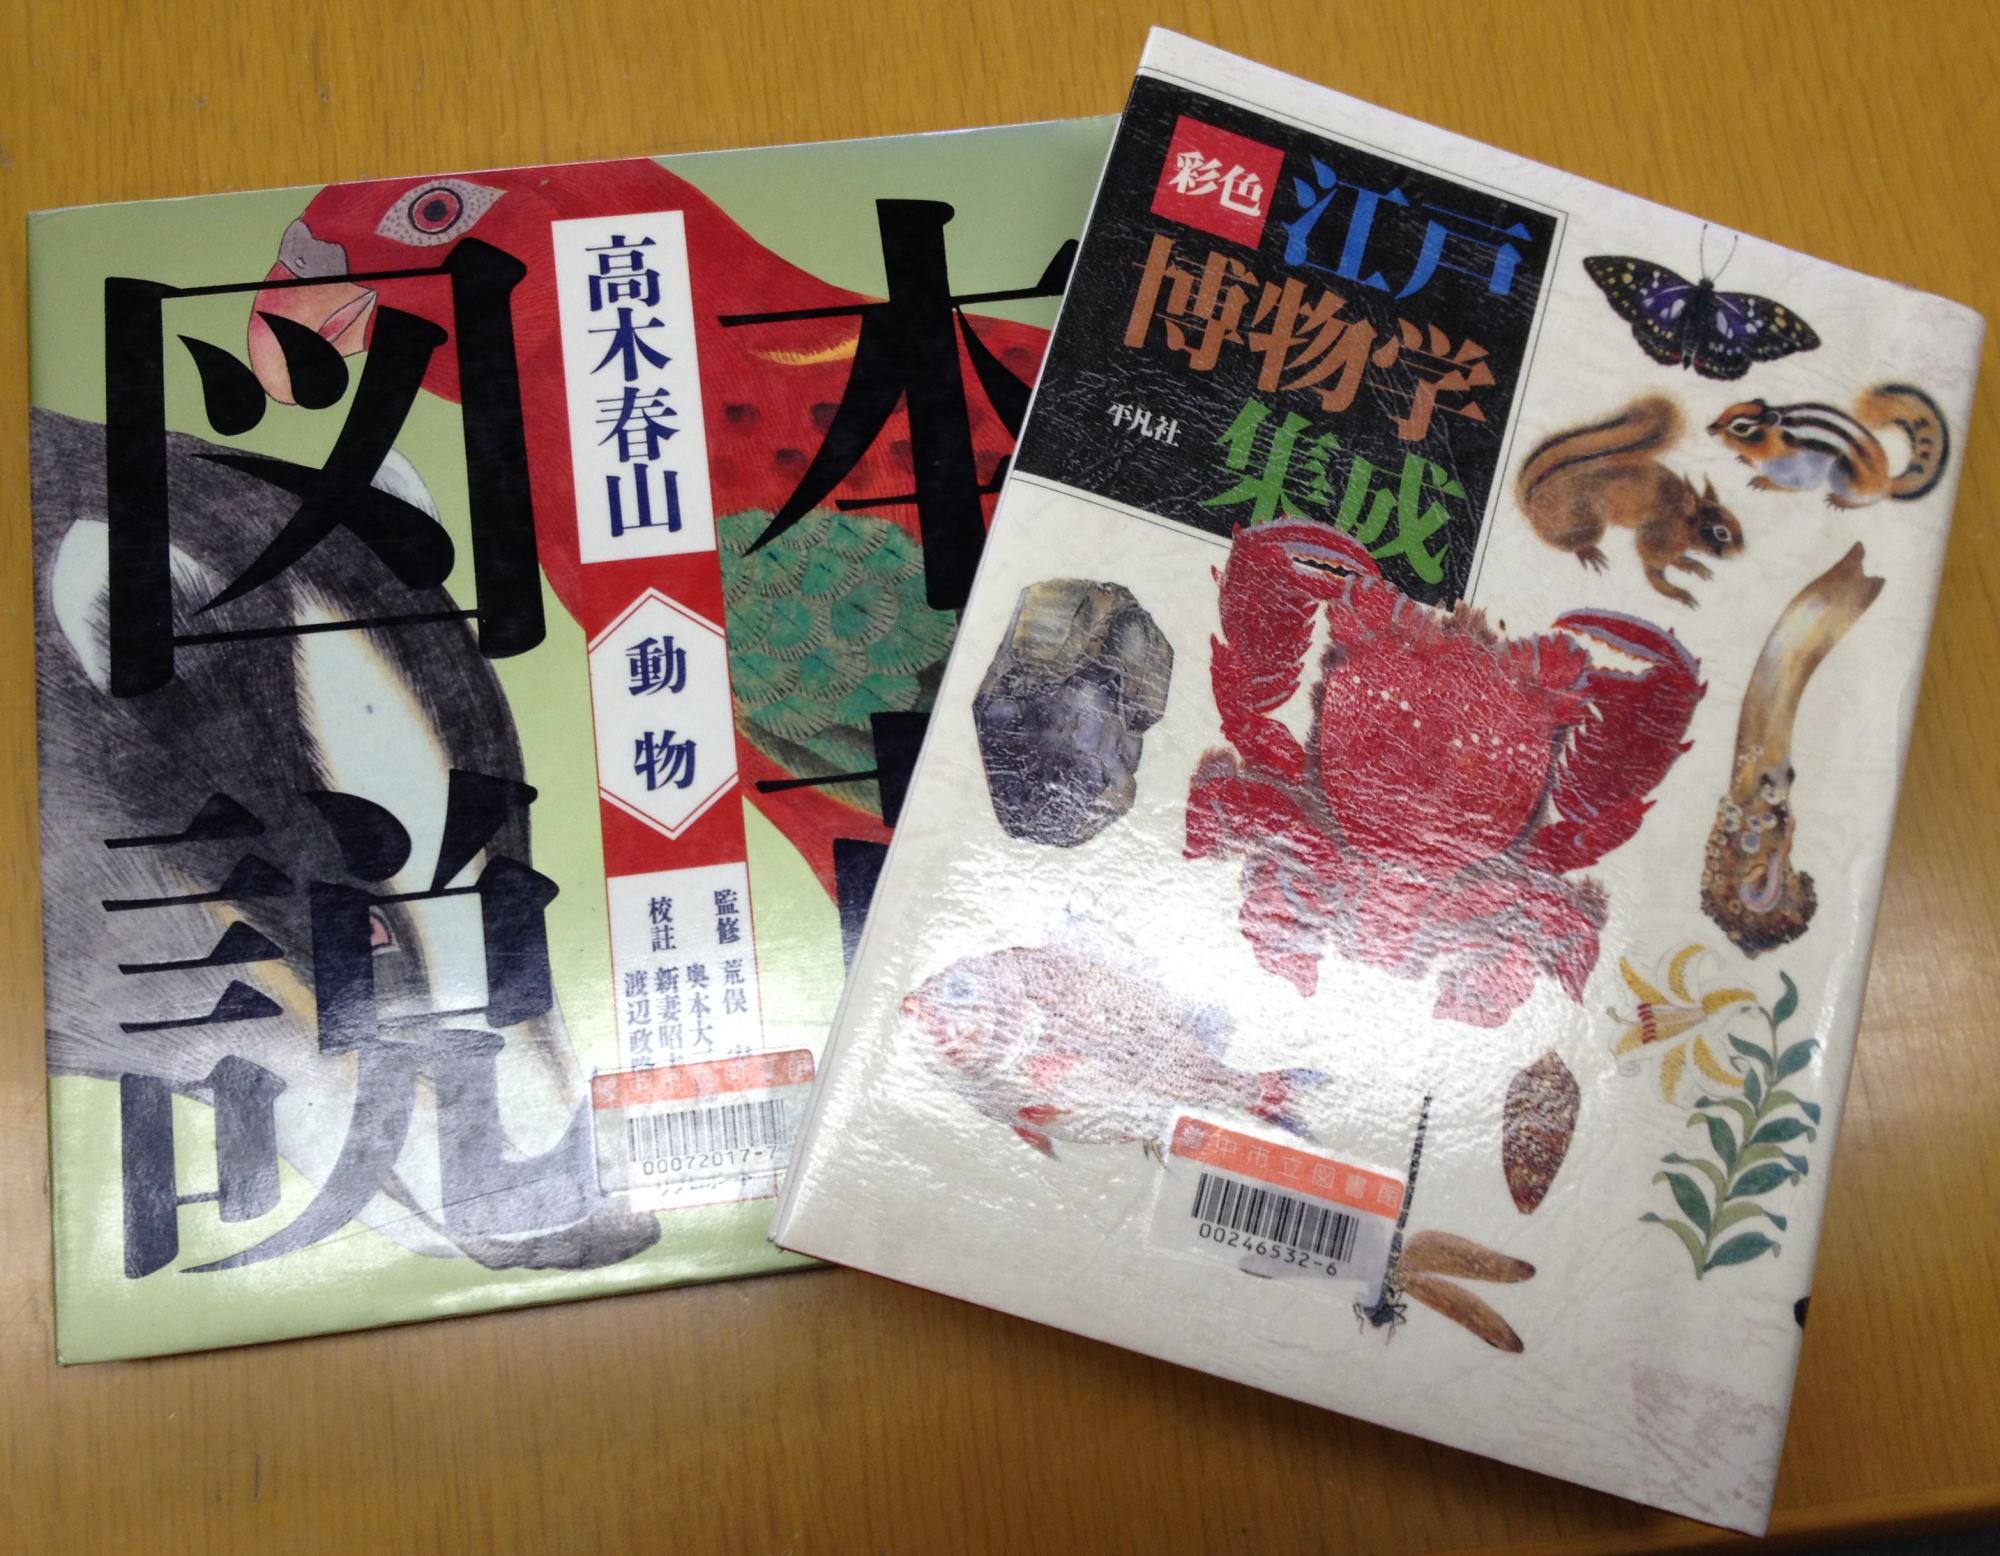 SANKEI EXPRESS BOOKWARE 松岡正剛 クールジャパン-3